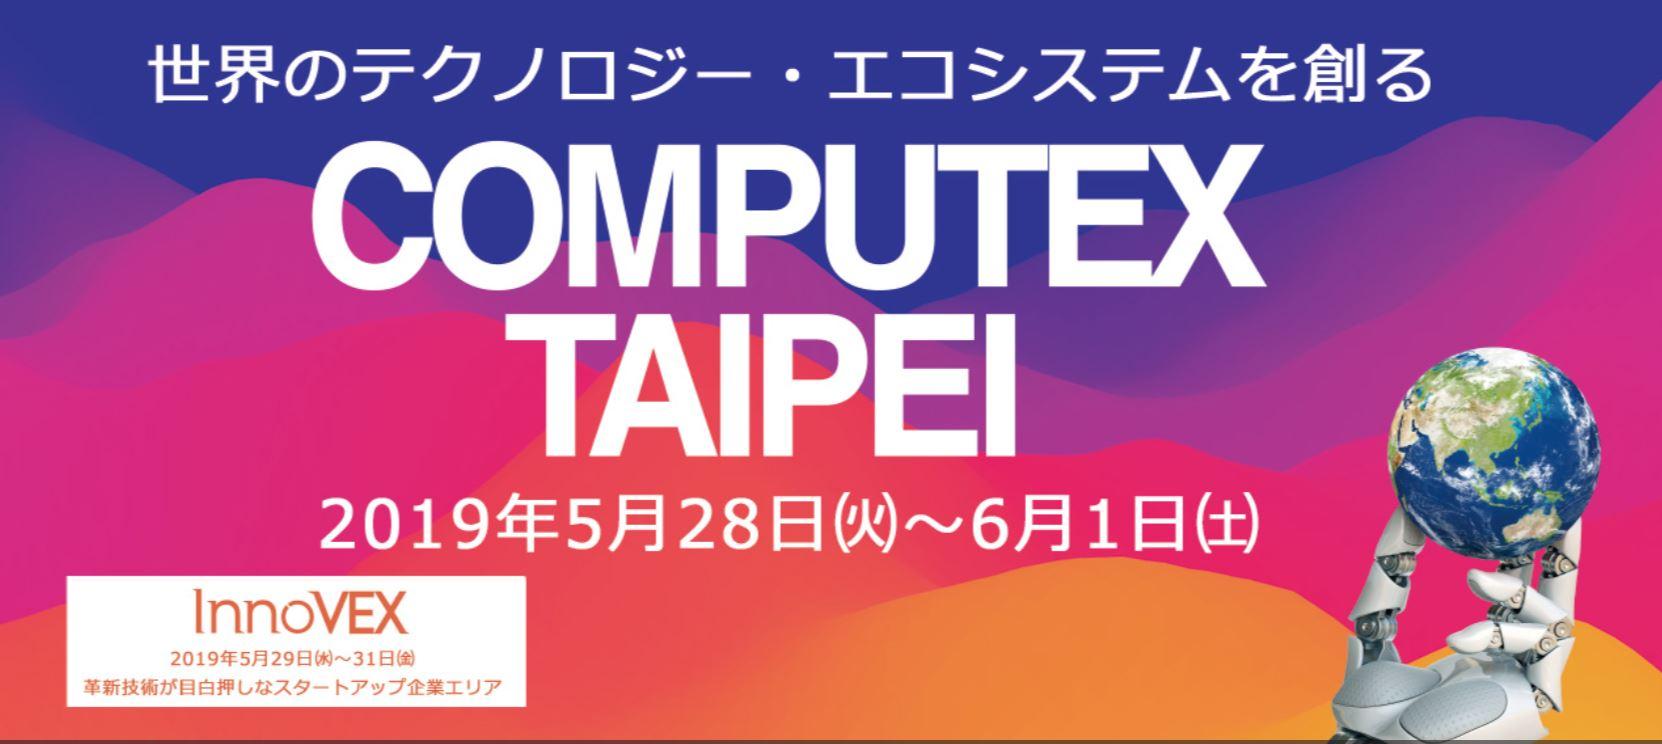 COMPUTEX TAIPEI 2019 - 2019/05 | Online Trade Fair Database (J-messe